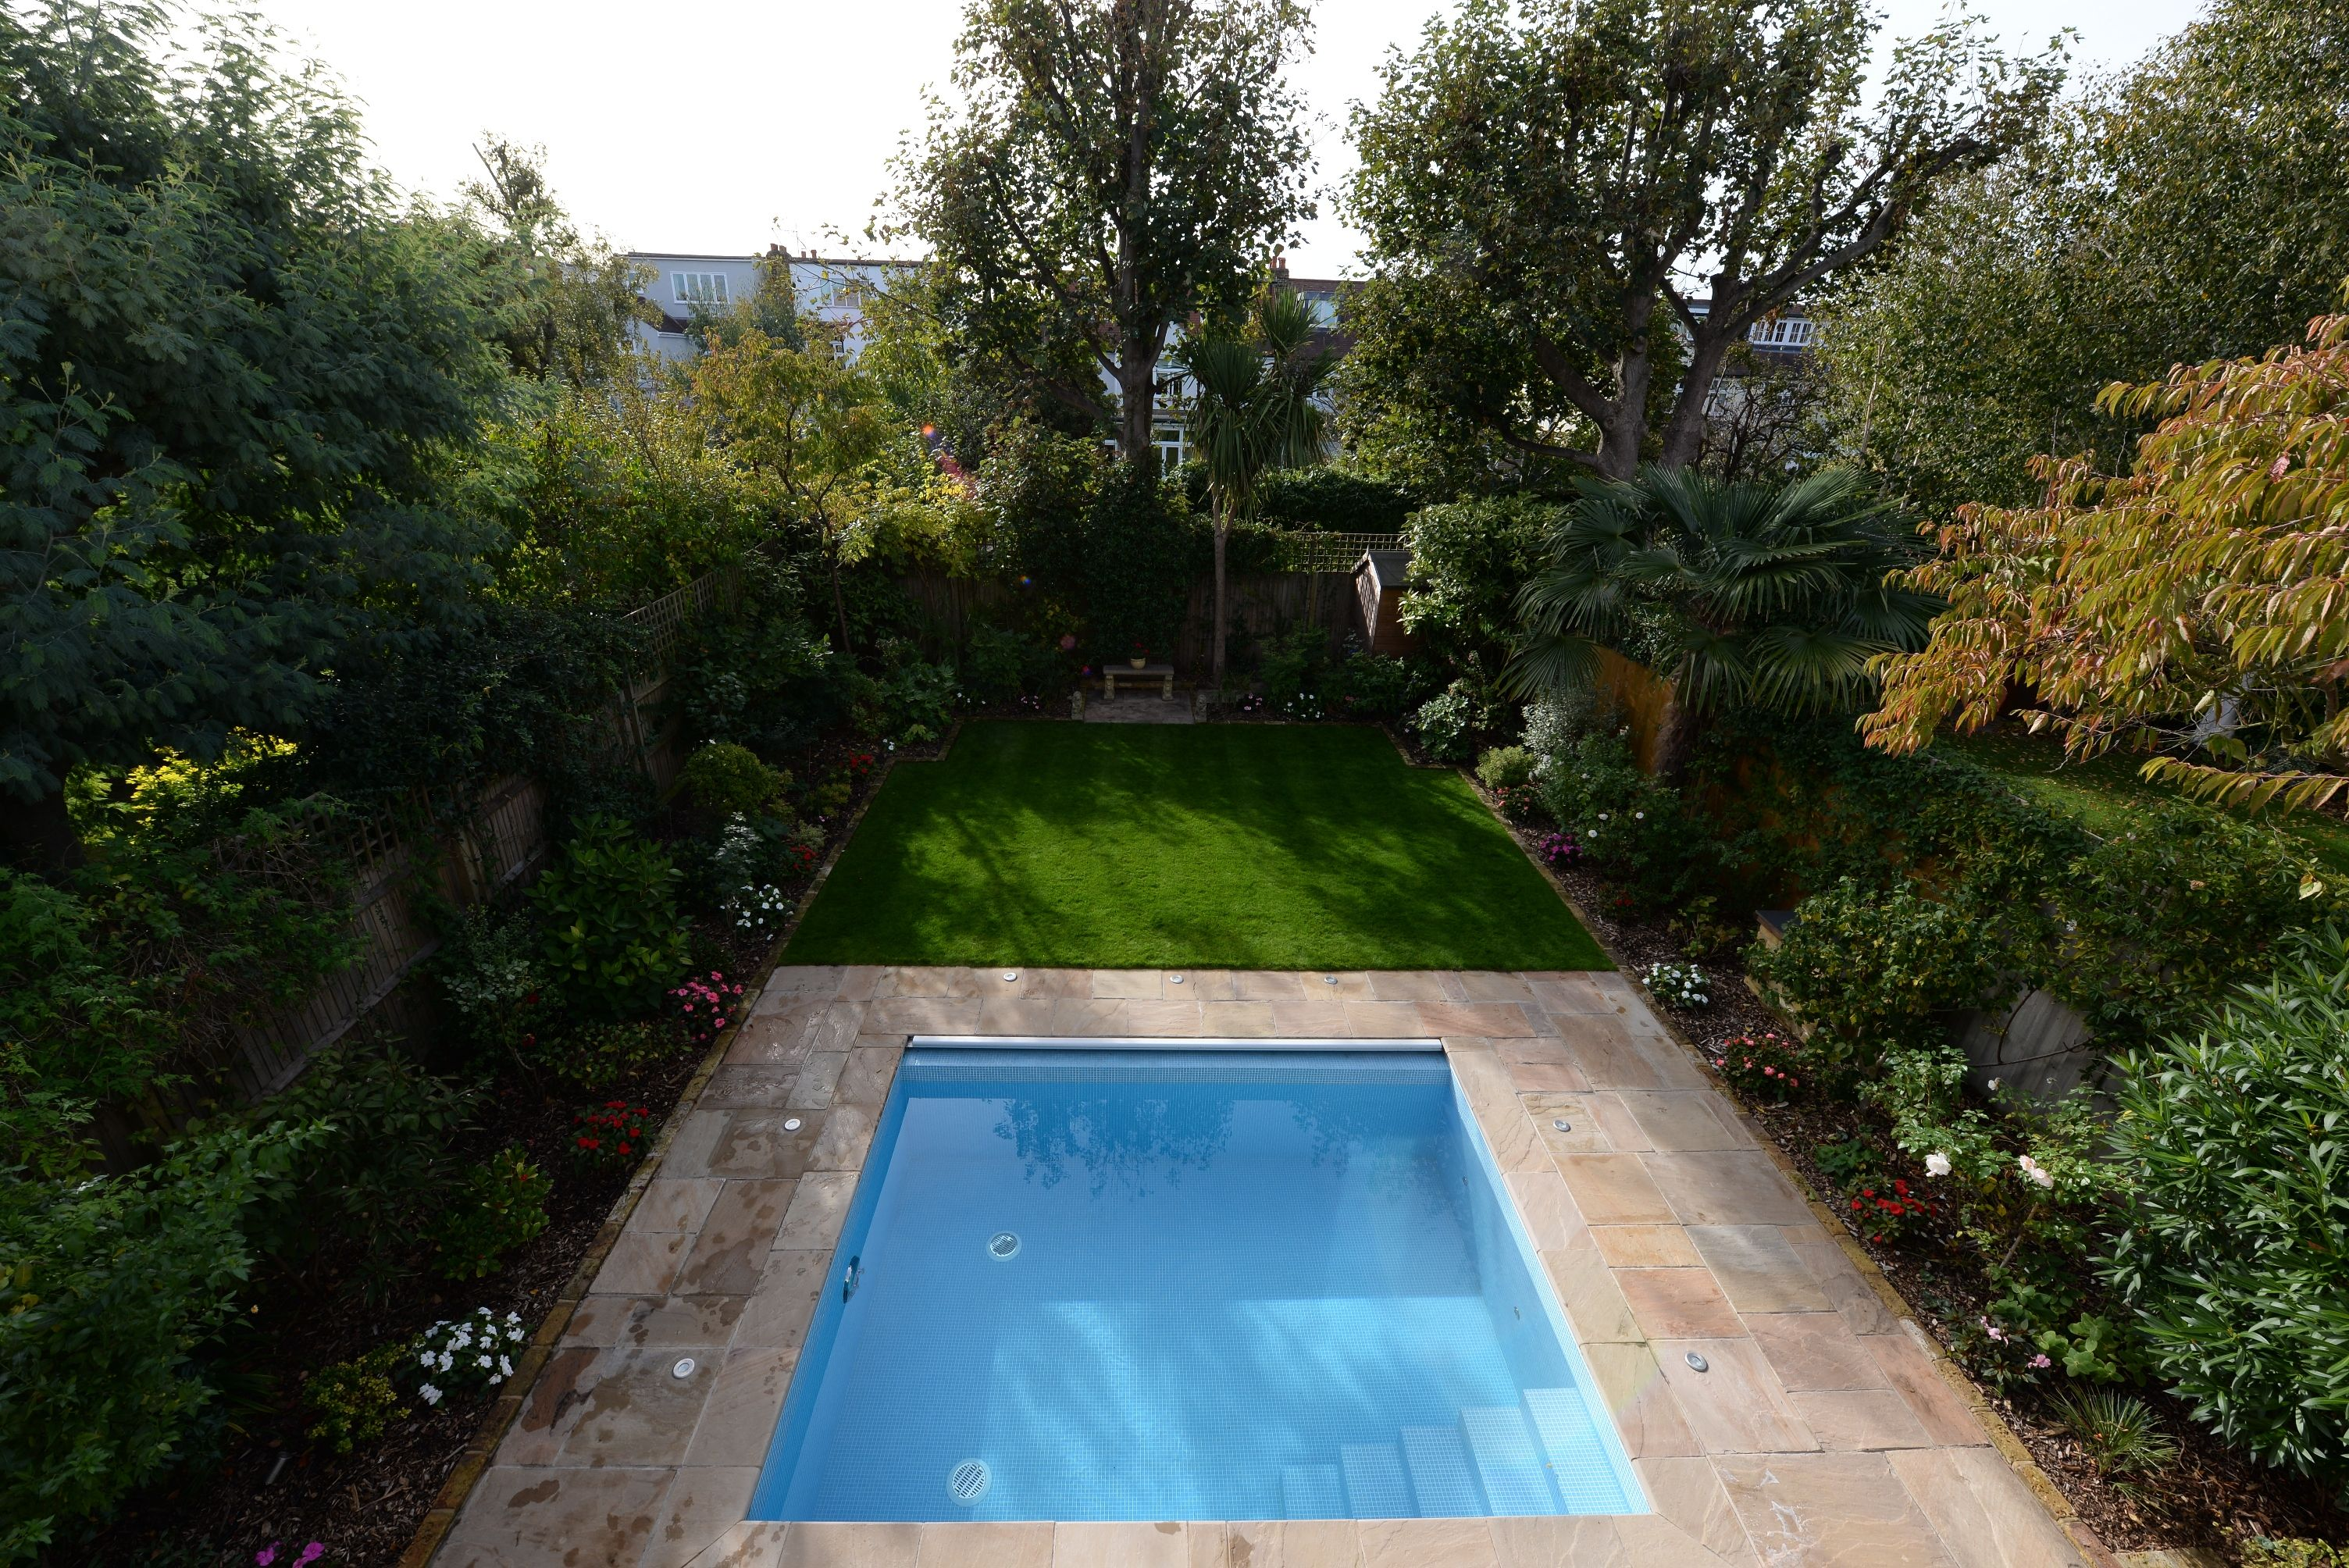 Swimming Pool Refurbishment Pool Kidney Shaped Pool Swimming Pools